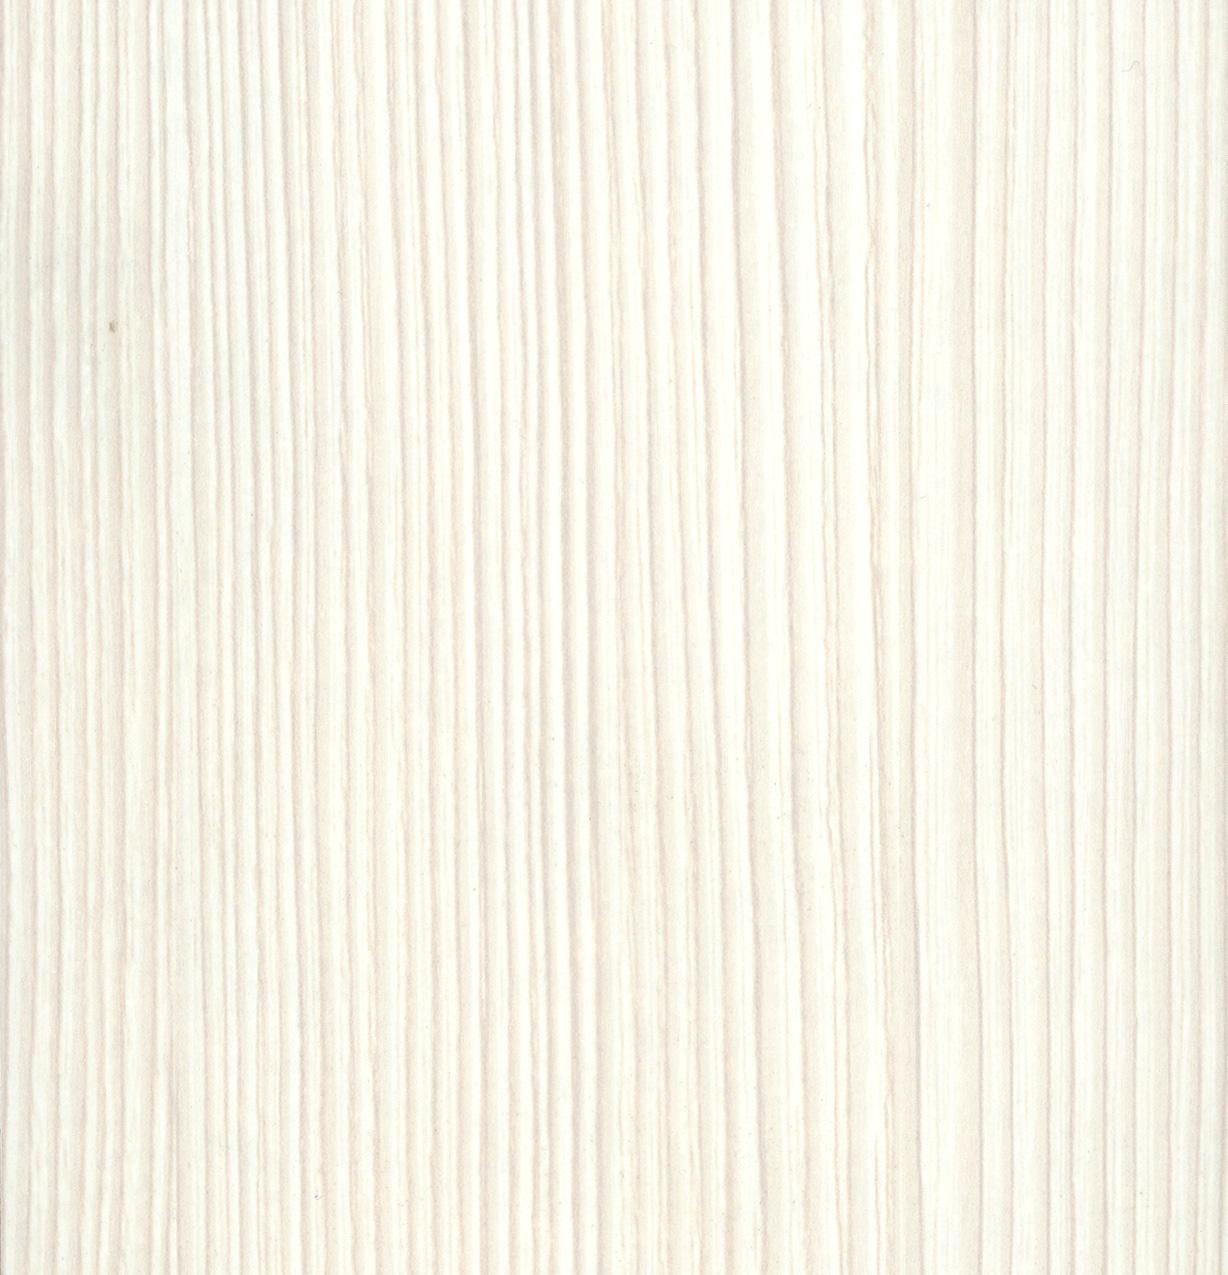 Woodline 1424